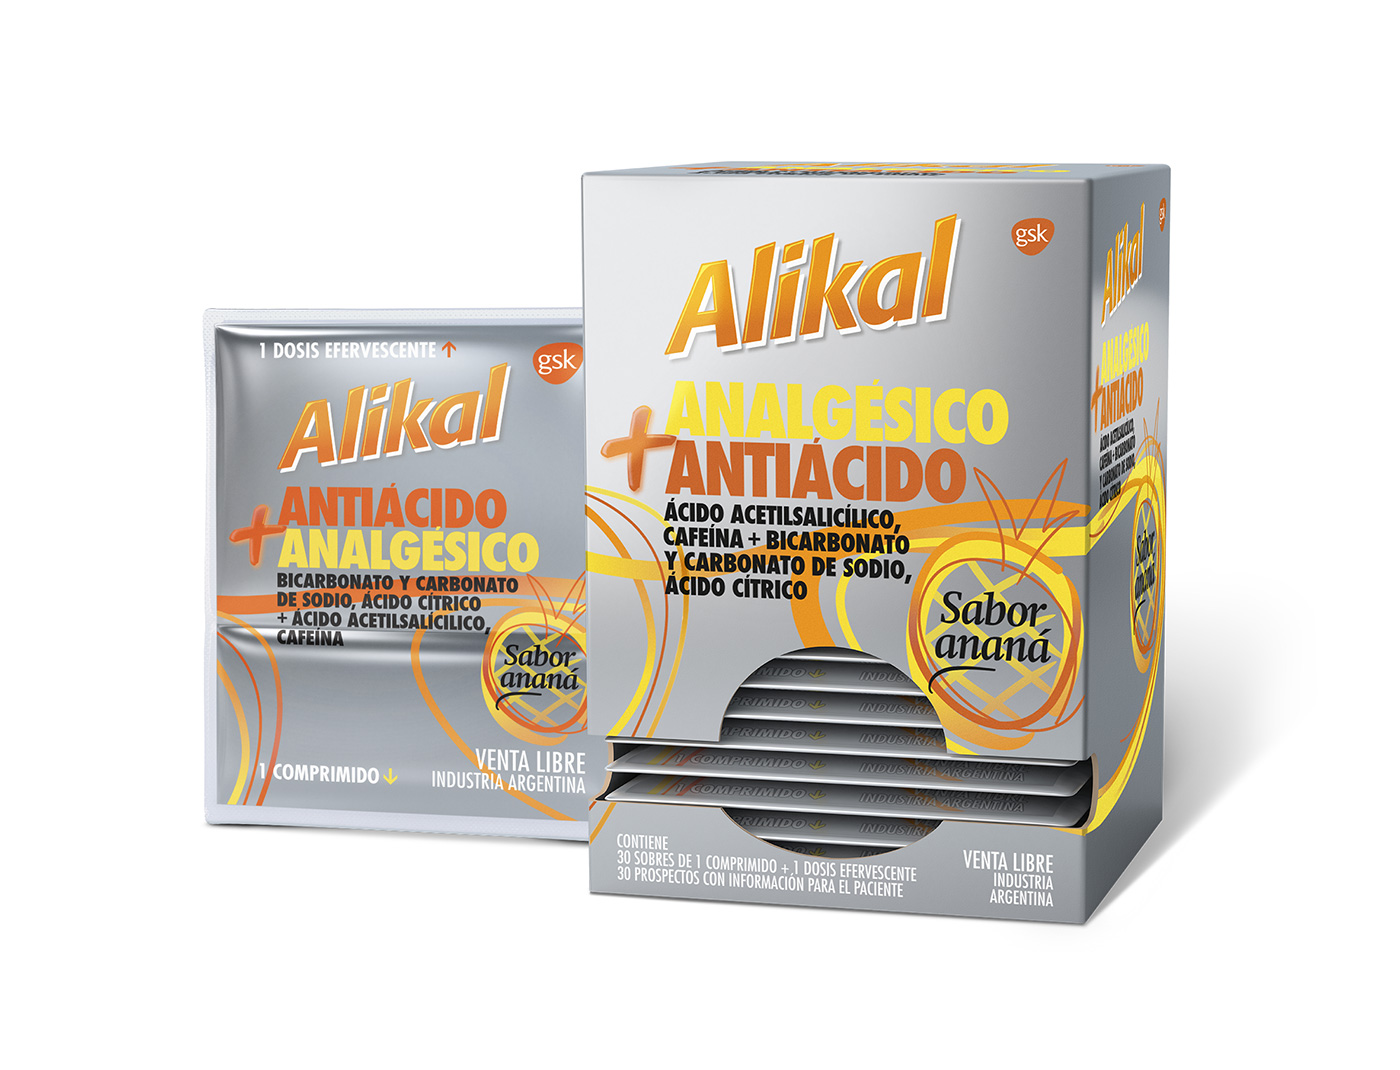 Cliente: Alikal   Agencia: GreyGroup